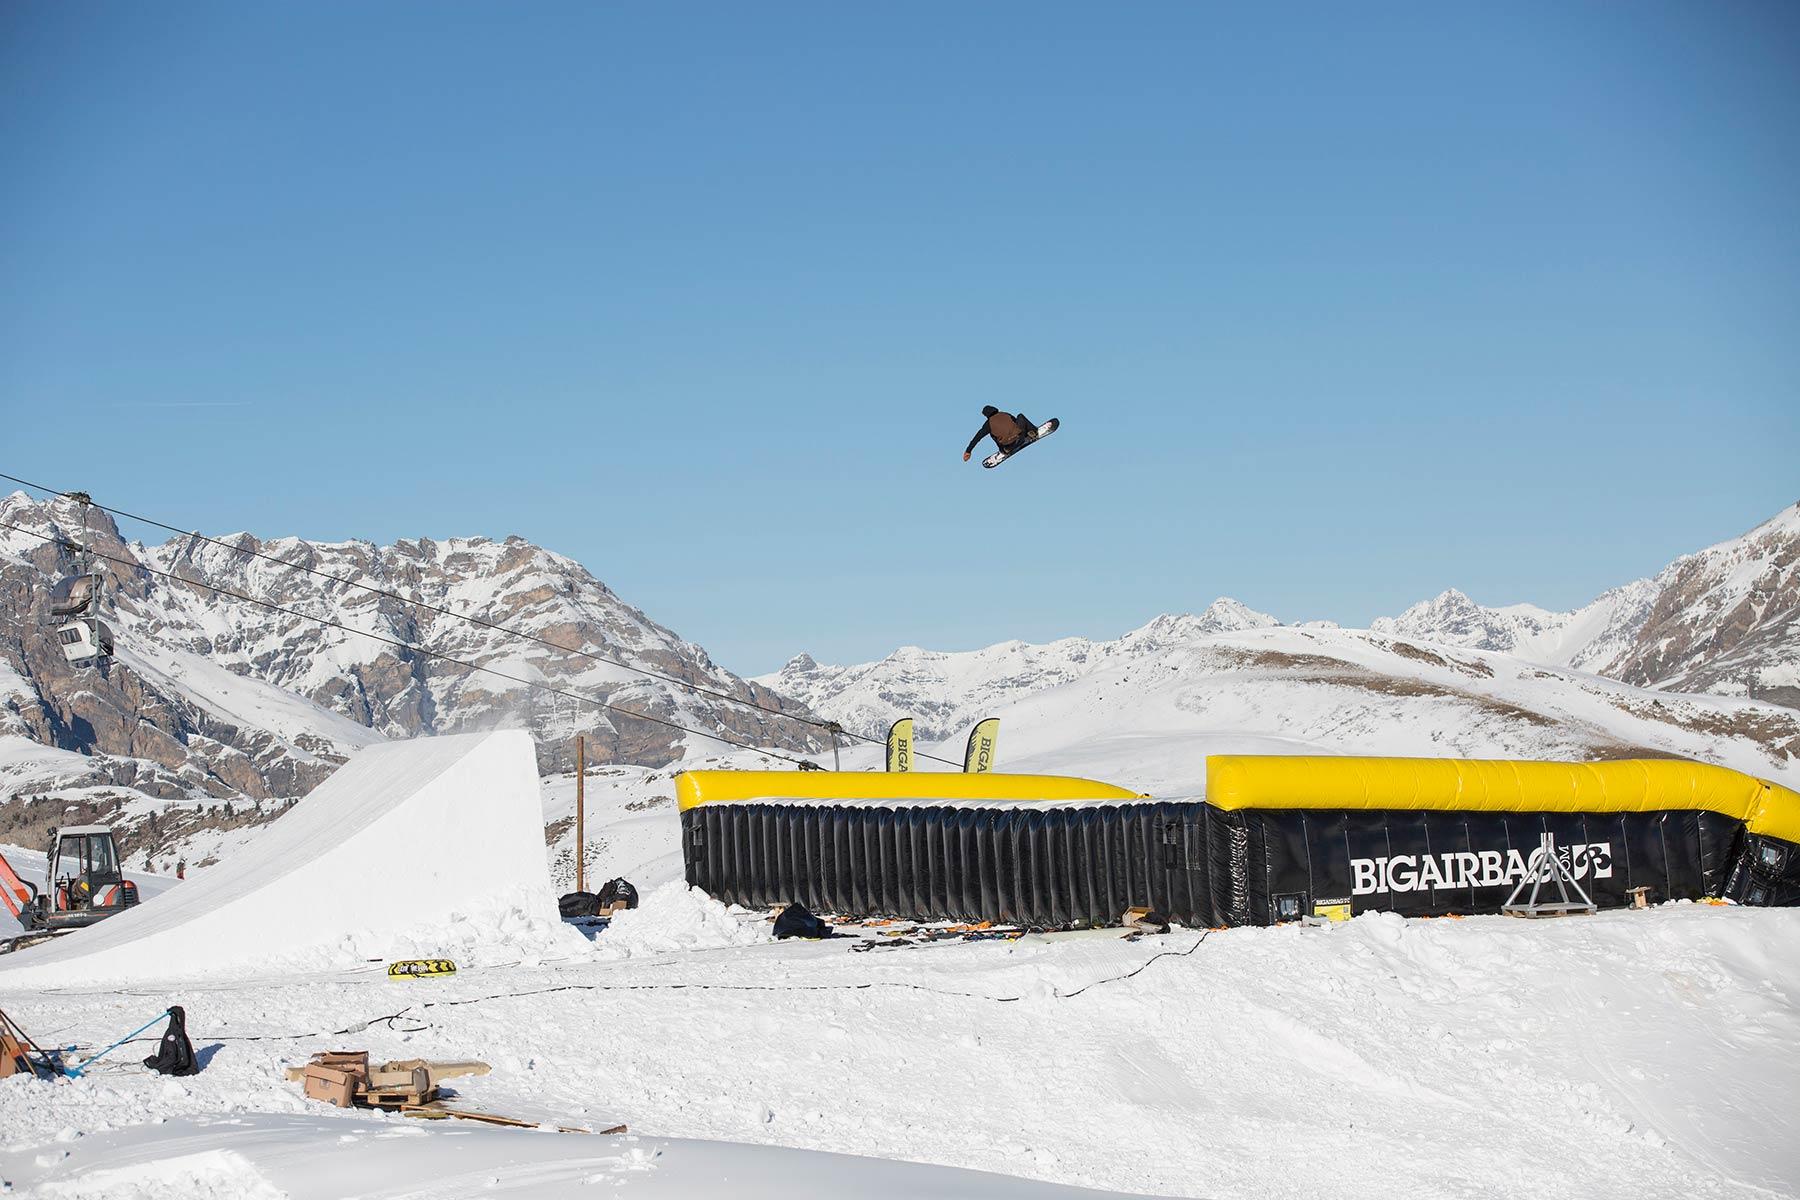 Snowboarder Billy Morgan